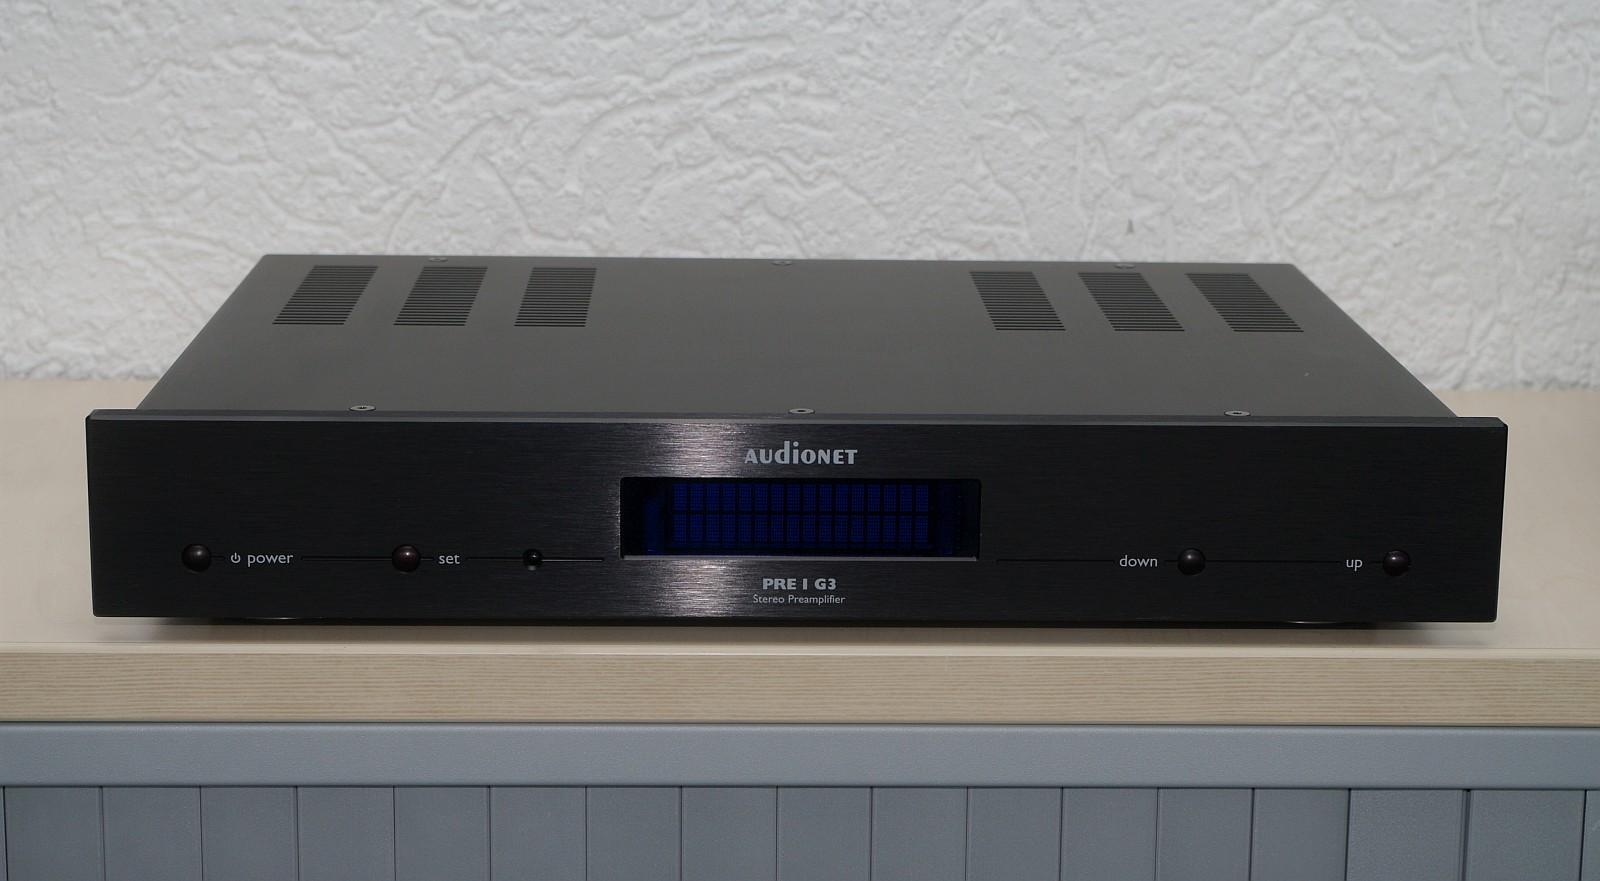 Audionet PRE 1 G3